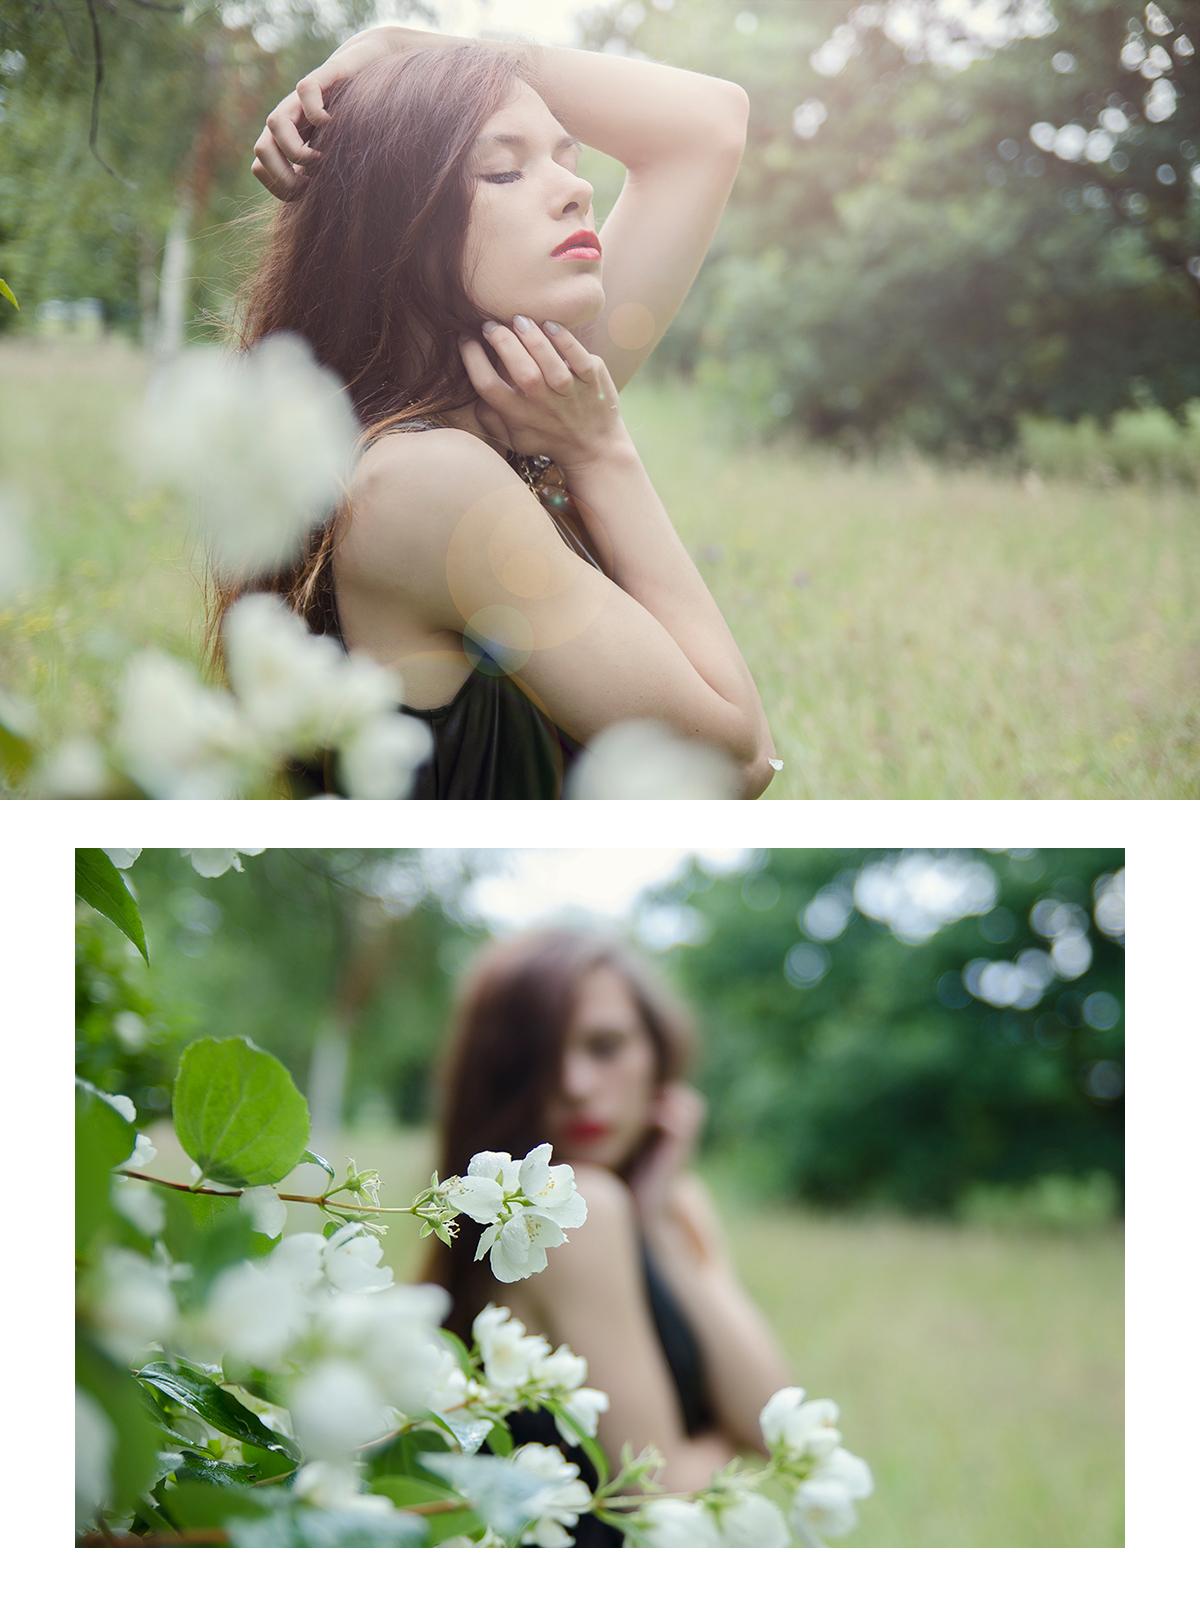 Aleksandra-kiss the rain